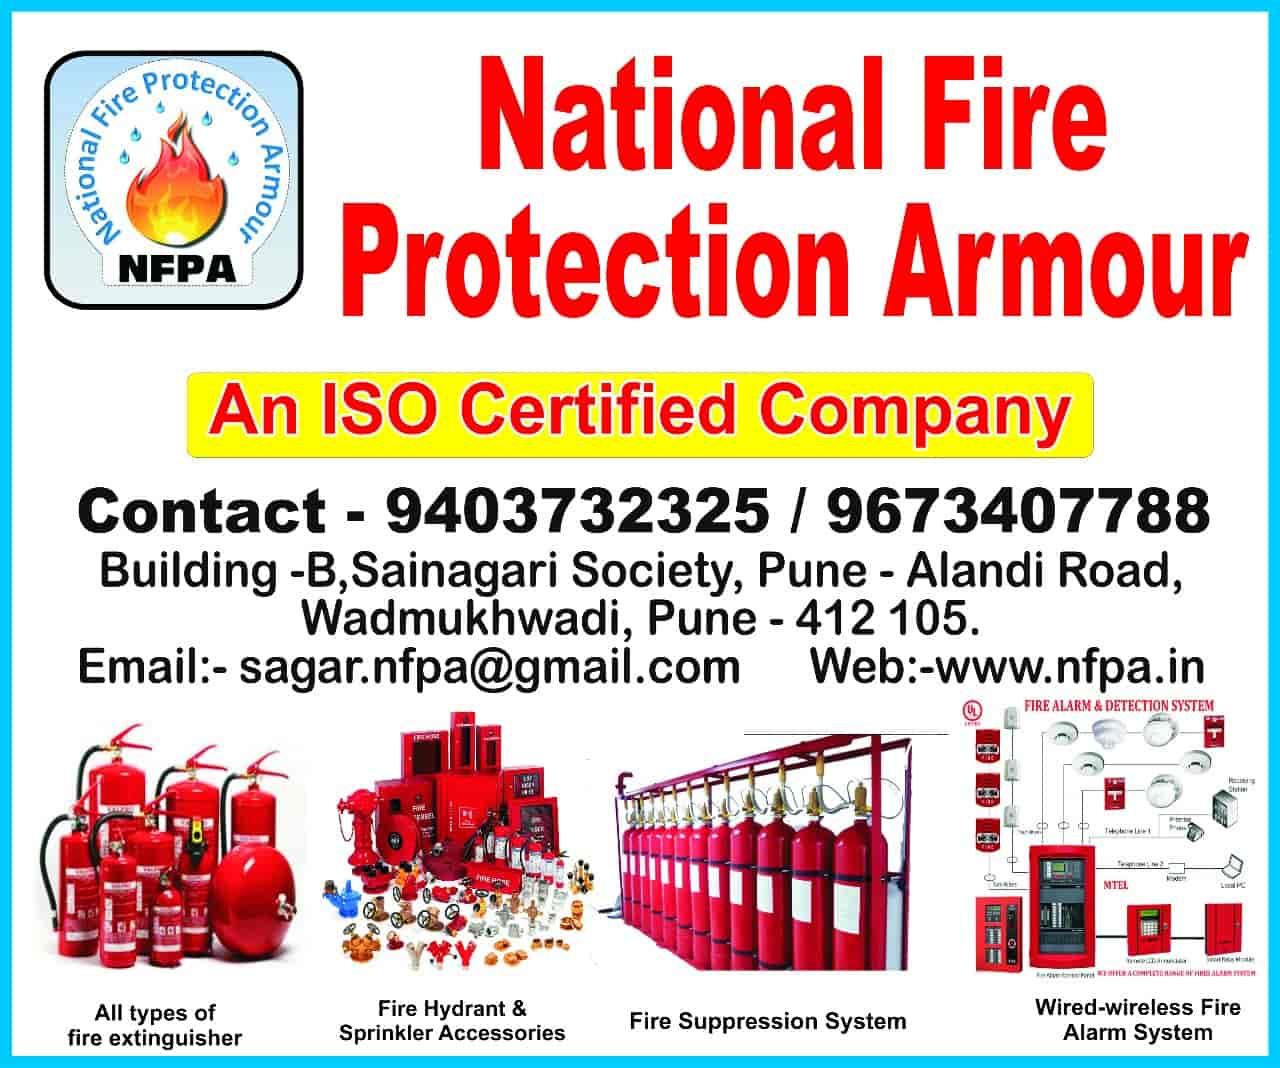 National Fire Protection Armour, Rethi Bowli - Fire